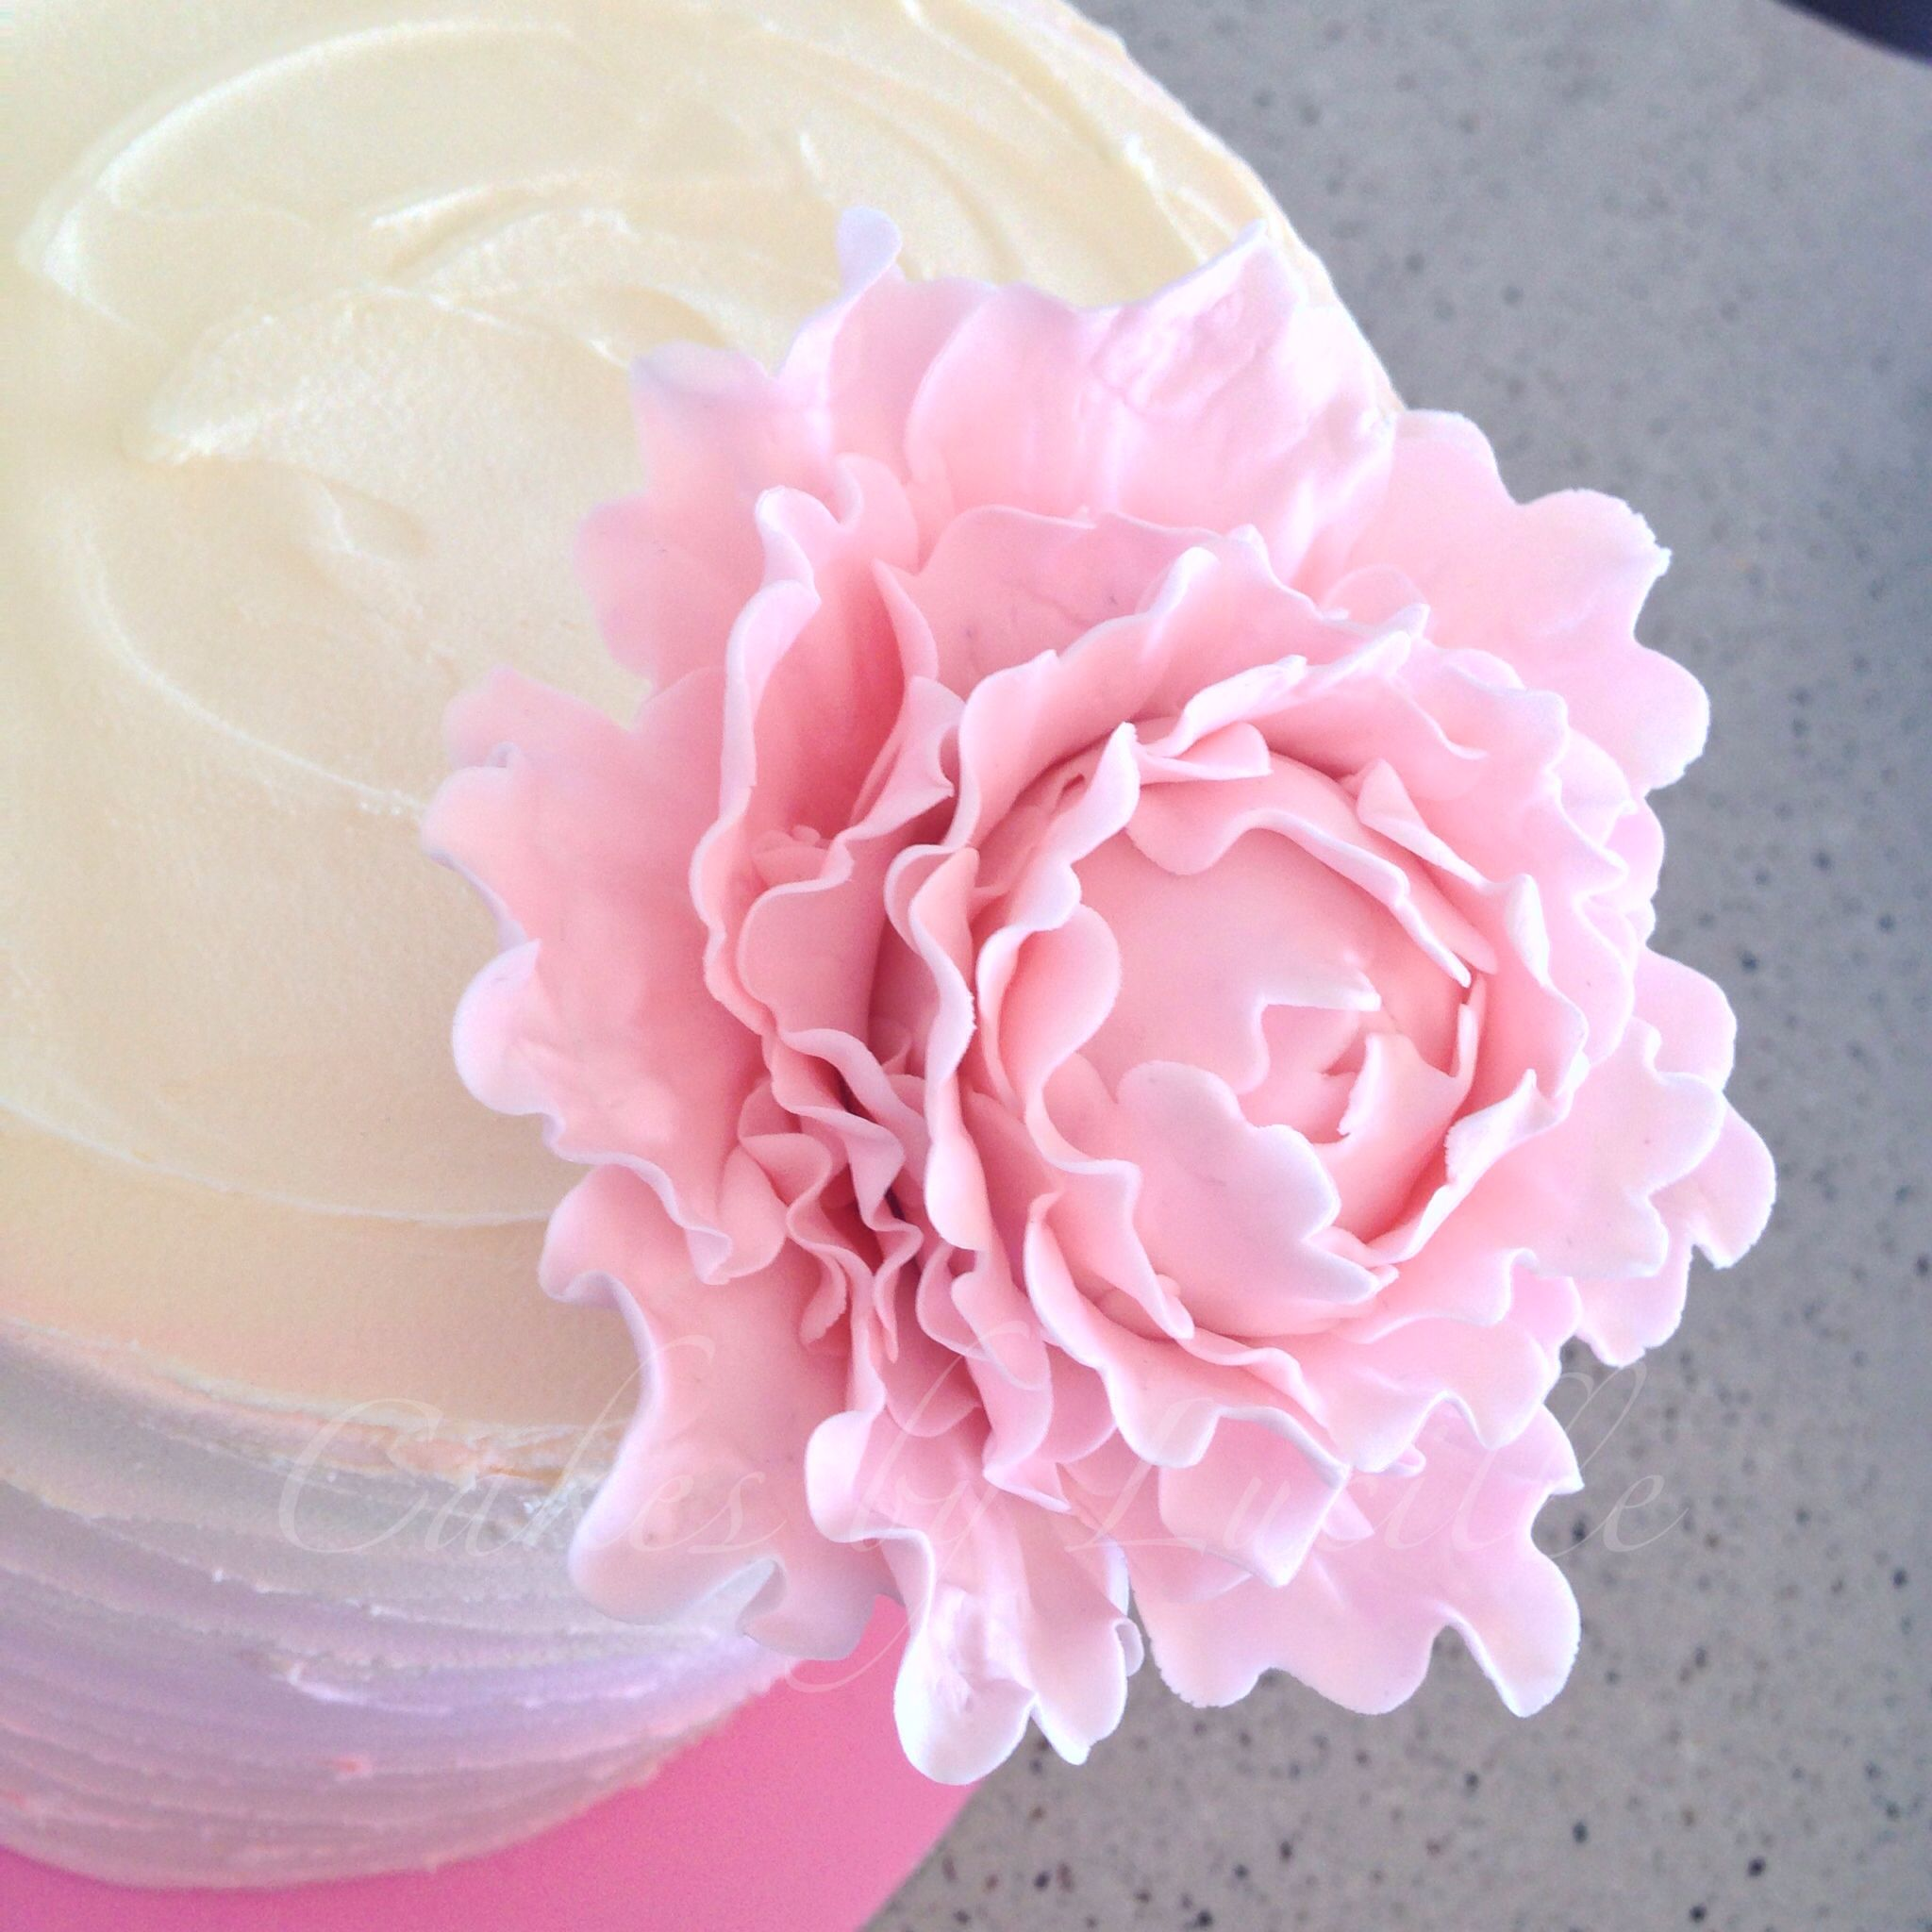 Handmade sugar flower